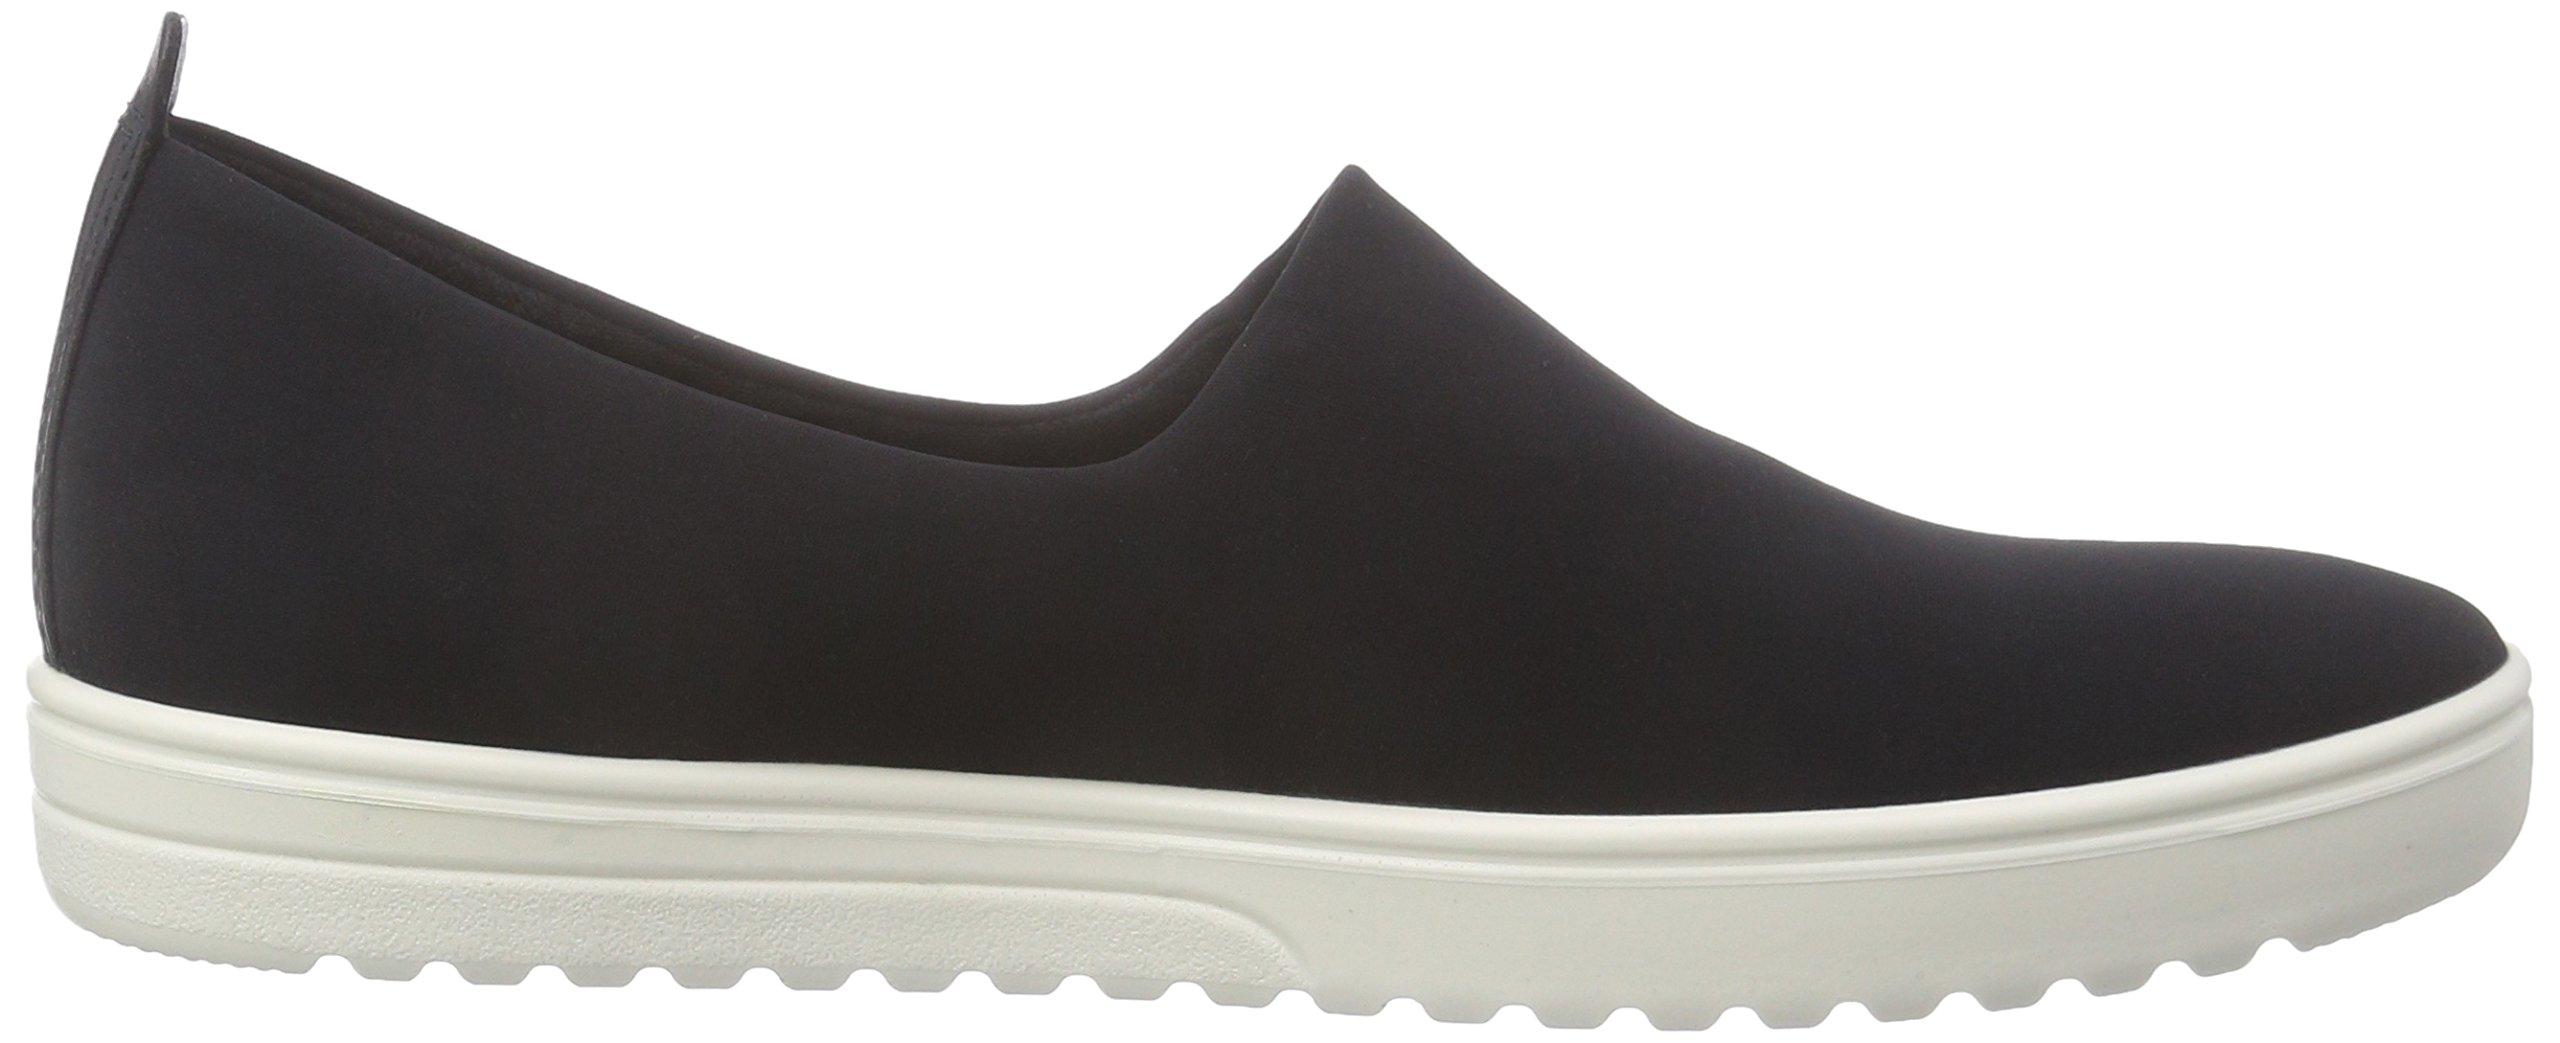 Ecco Footwear Womens Fara Slip-On Loafer, Black/Black, 42 EU/11-11.5 M US by ECCO (Image #6)